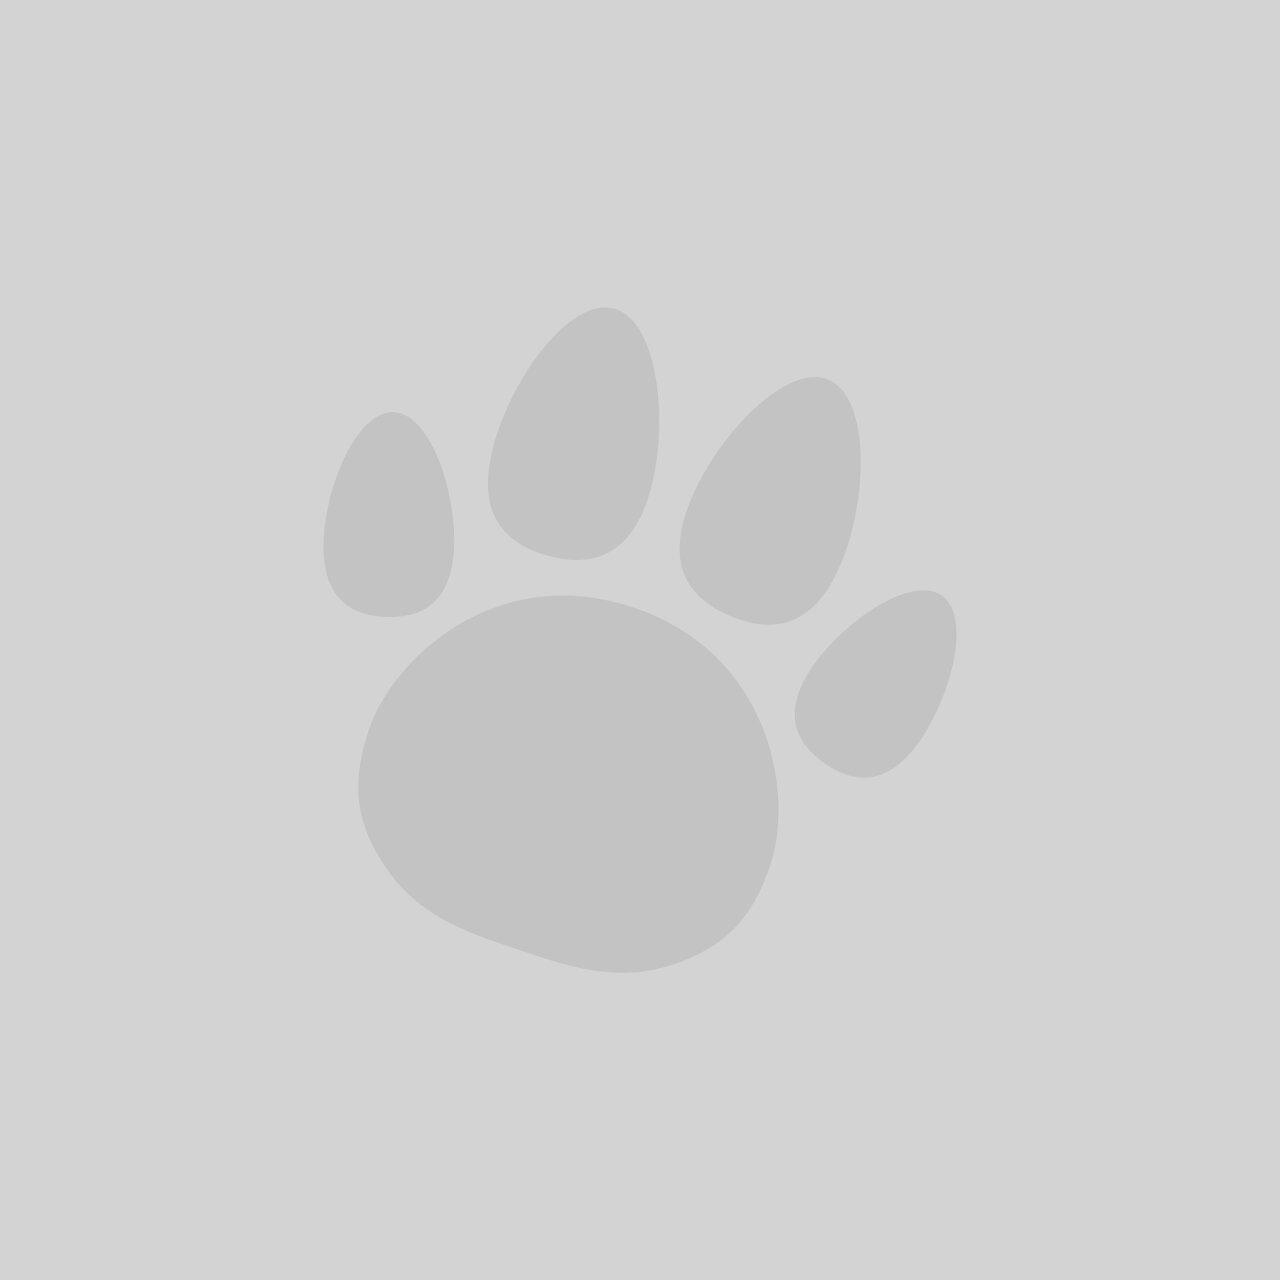 Feliway Classic Diffuser Refill 3 Pack